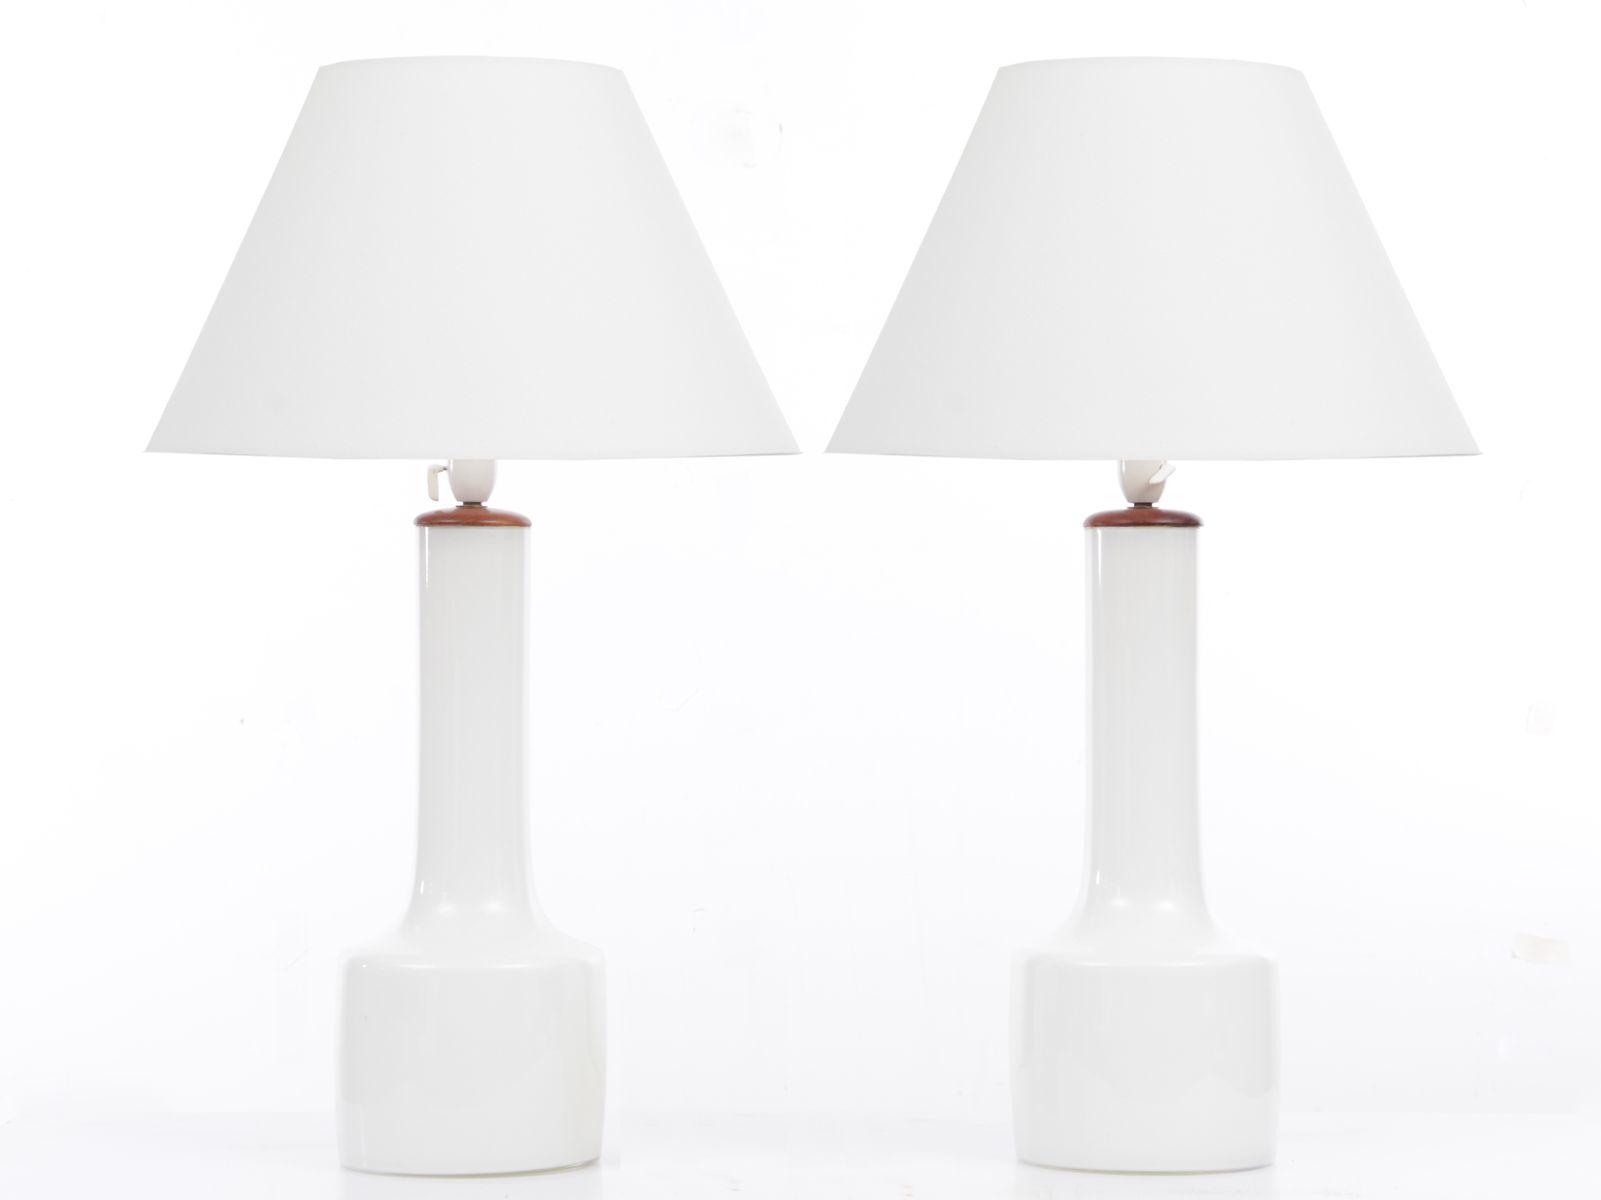 Skandinavische Mid-Century Modern Opalglas Tischlampen, 2er Set